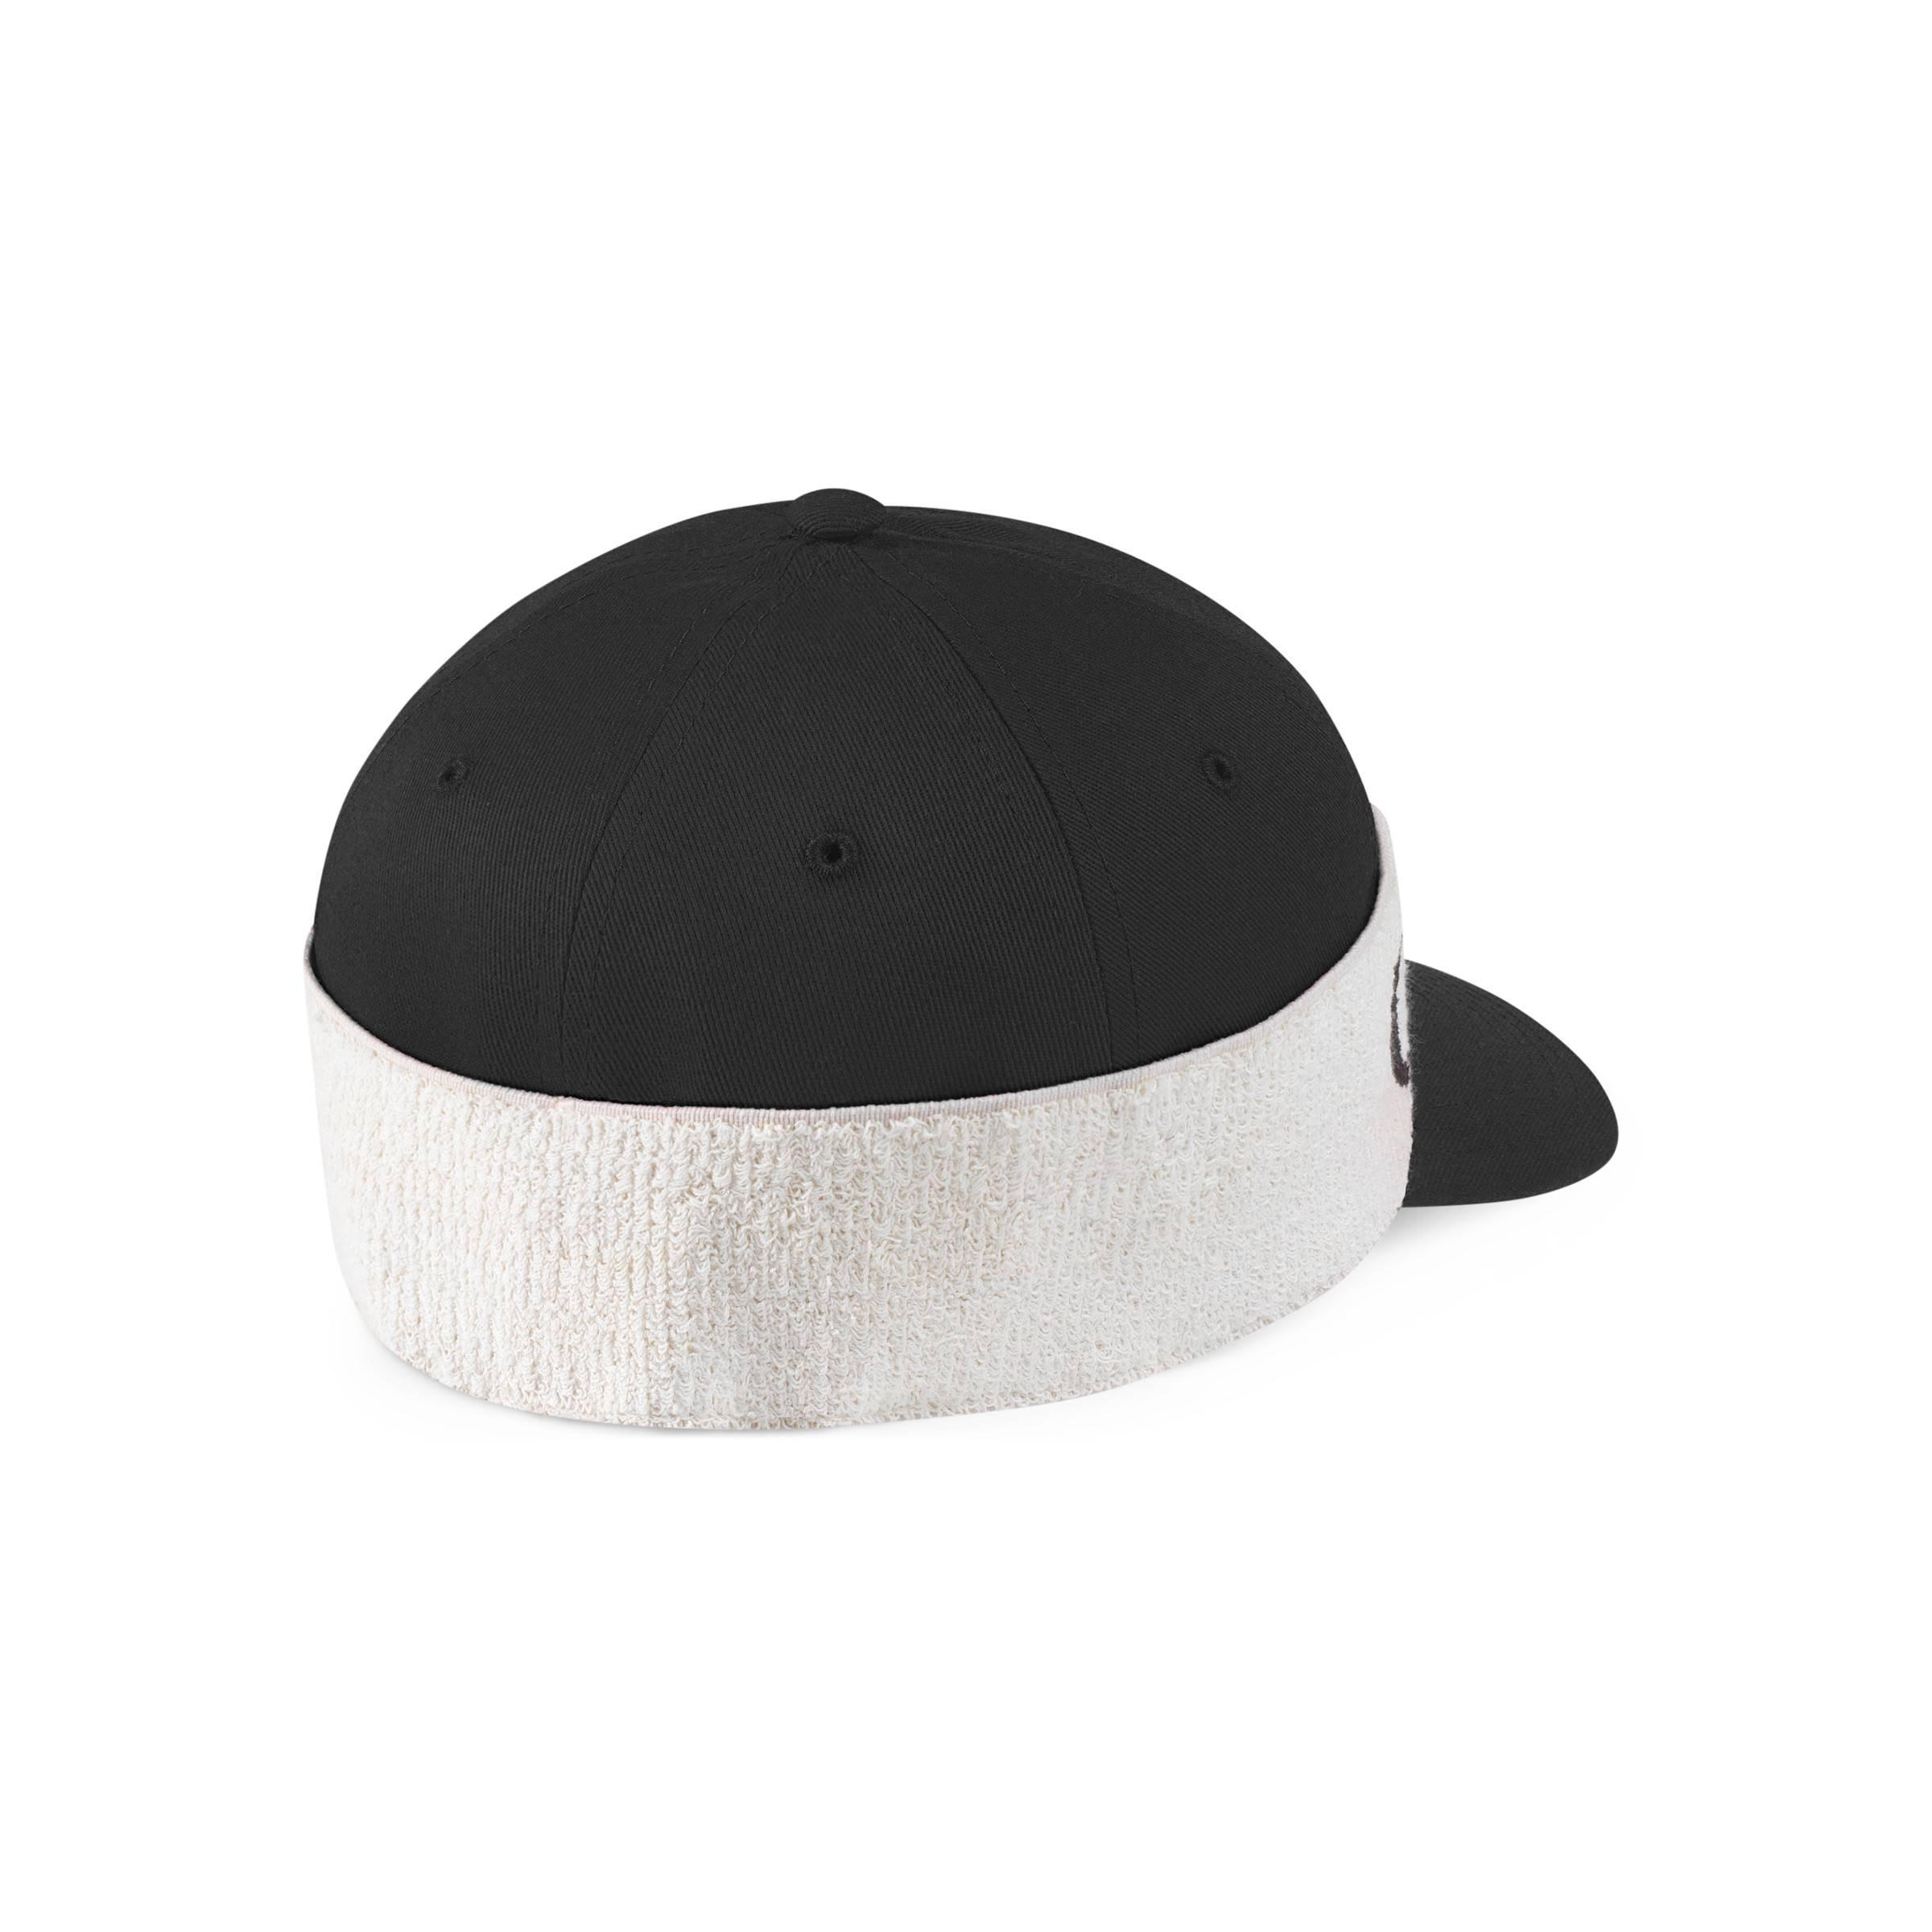 21eb2a0d440 Gucci - Black Baseball Hat With Headband - Lyst. View fullscreen